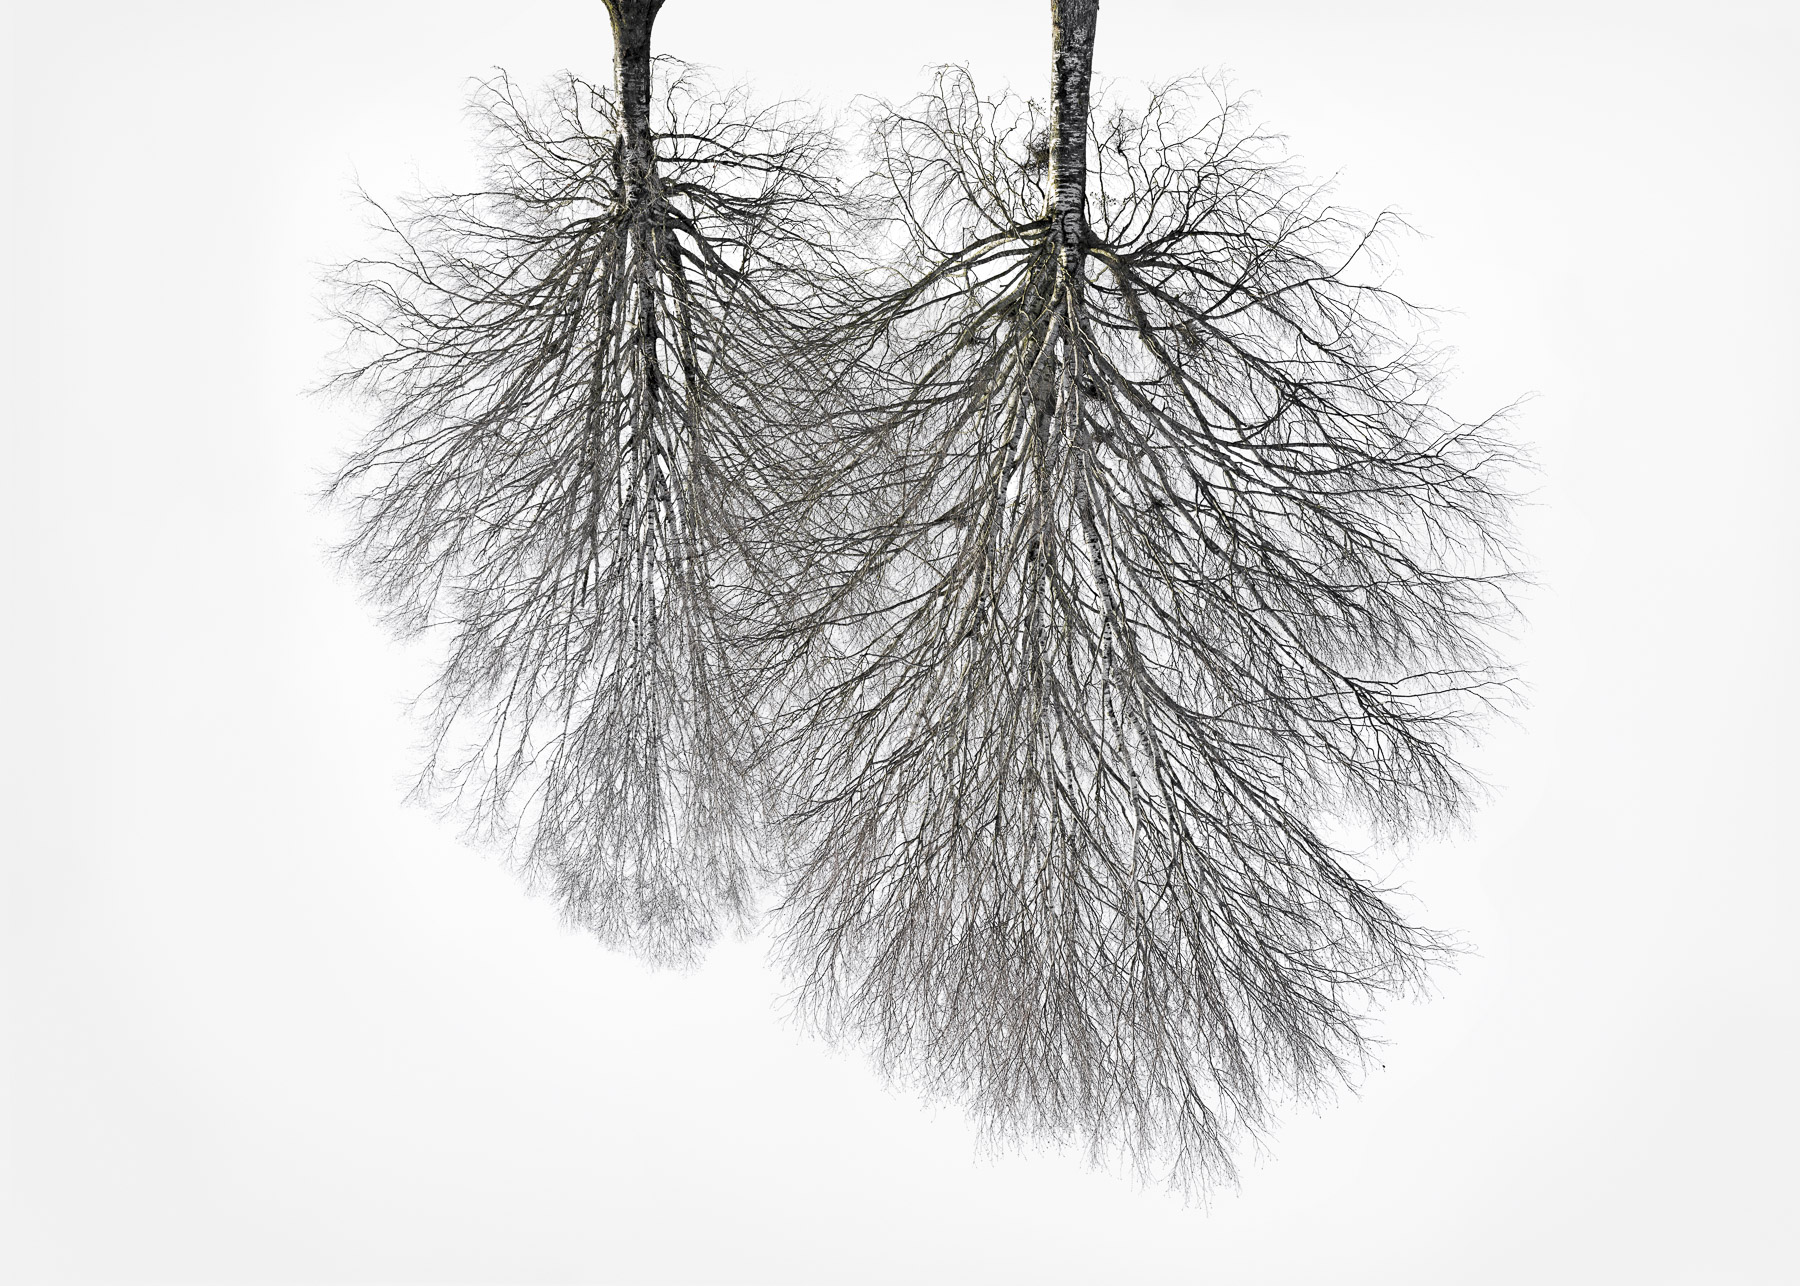 Christoph_Franke_Tree-Crowns_TC-19_04.jpg